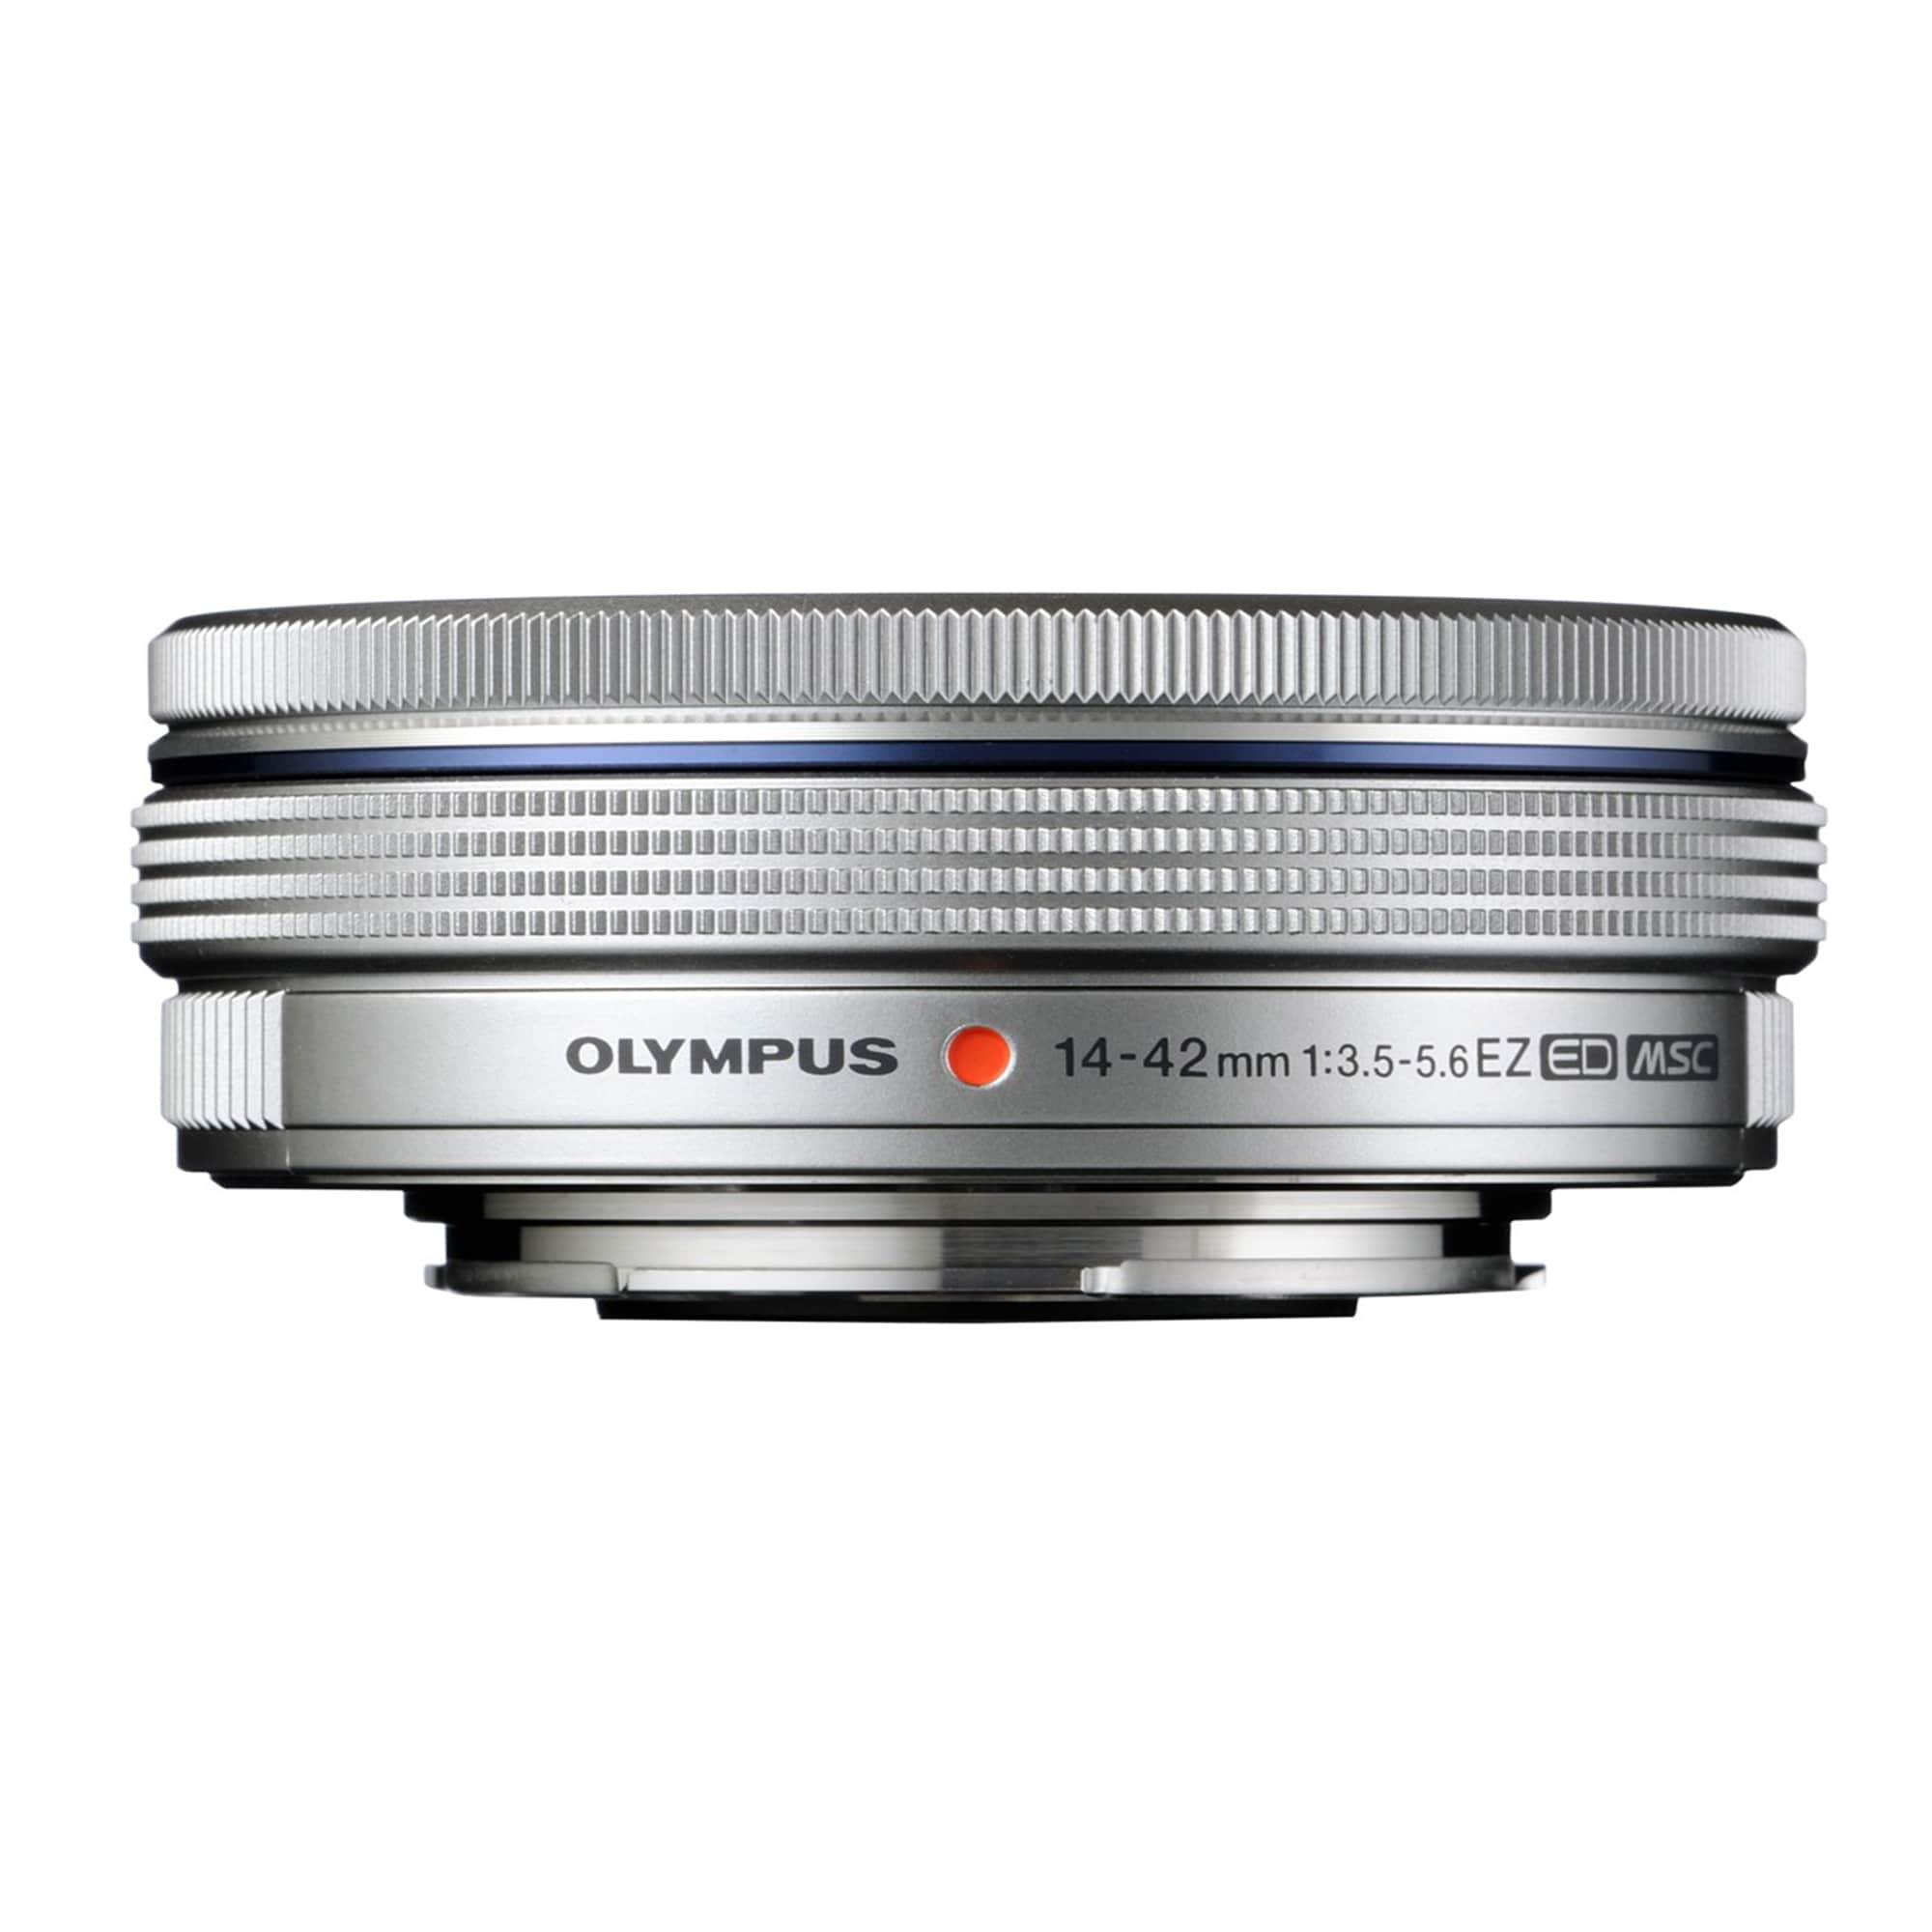 Olympus EZ ED MSC 14-42mm f/3,5-5,6